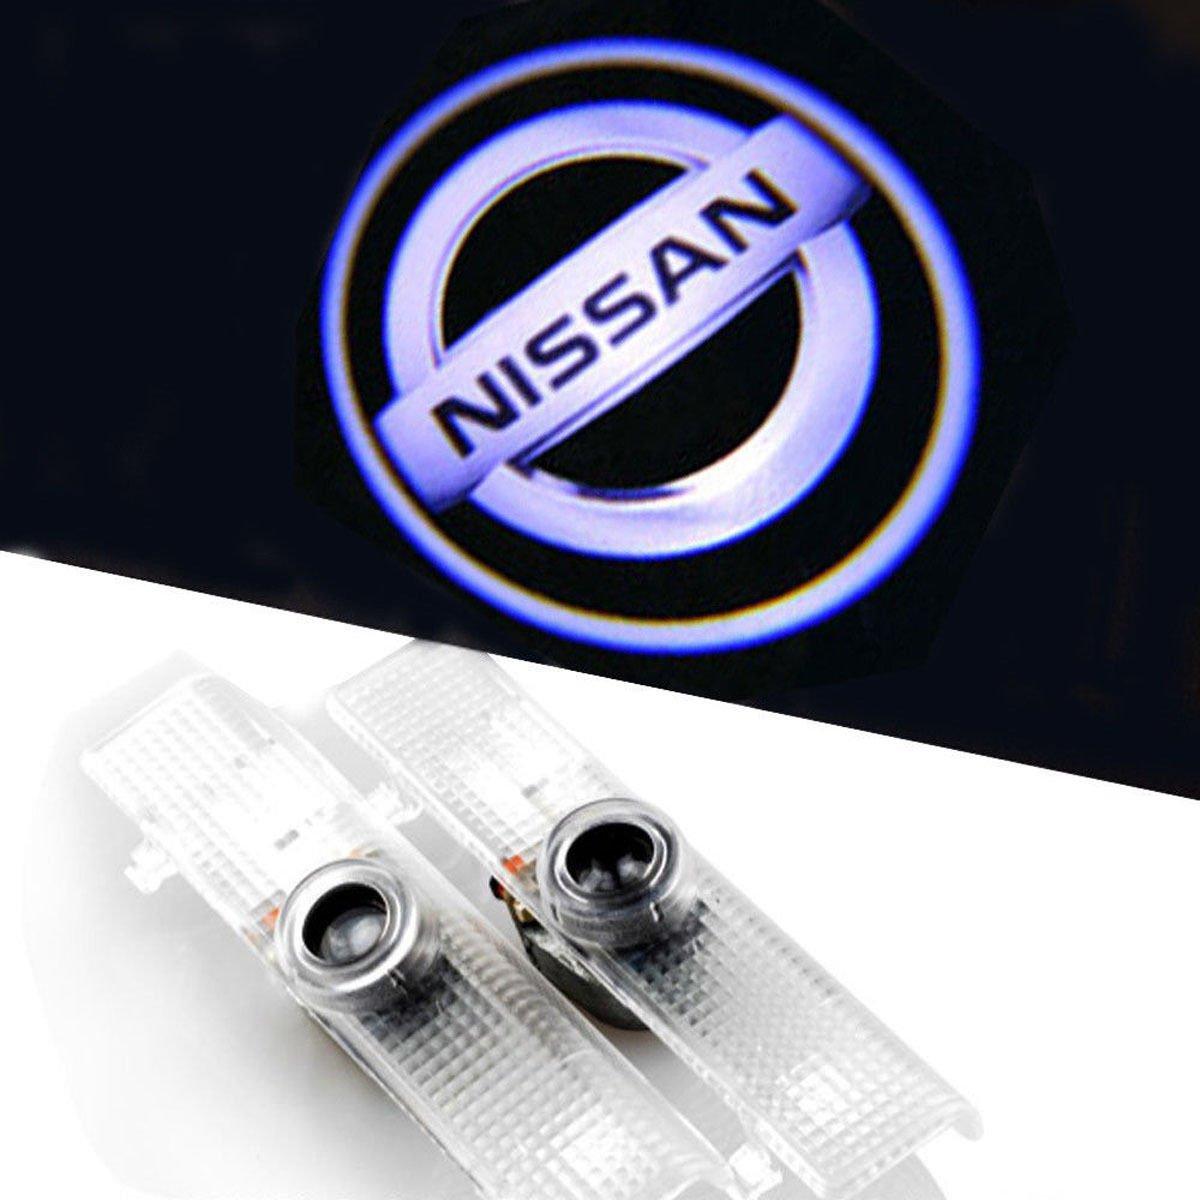 2X Cree LED Door Step Courtesy Light Laser Shadow Logo Projector Lamp For Nissan Armada Maxima 04-17 Quest 04-16 Titan 03-16 Altima Coupe 08-13 Altima Sedan 02-15 CNAutoLicht